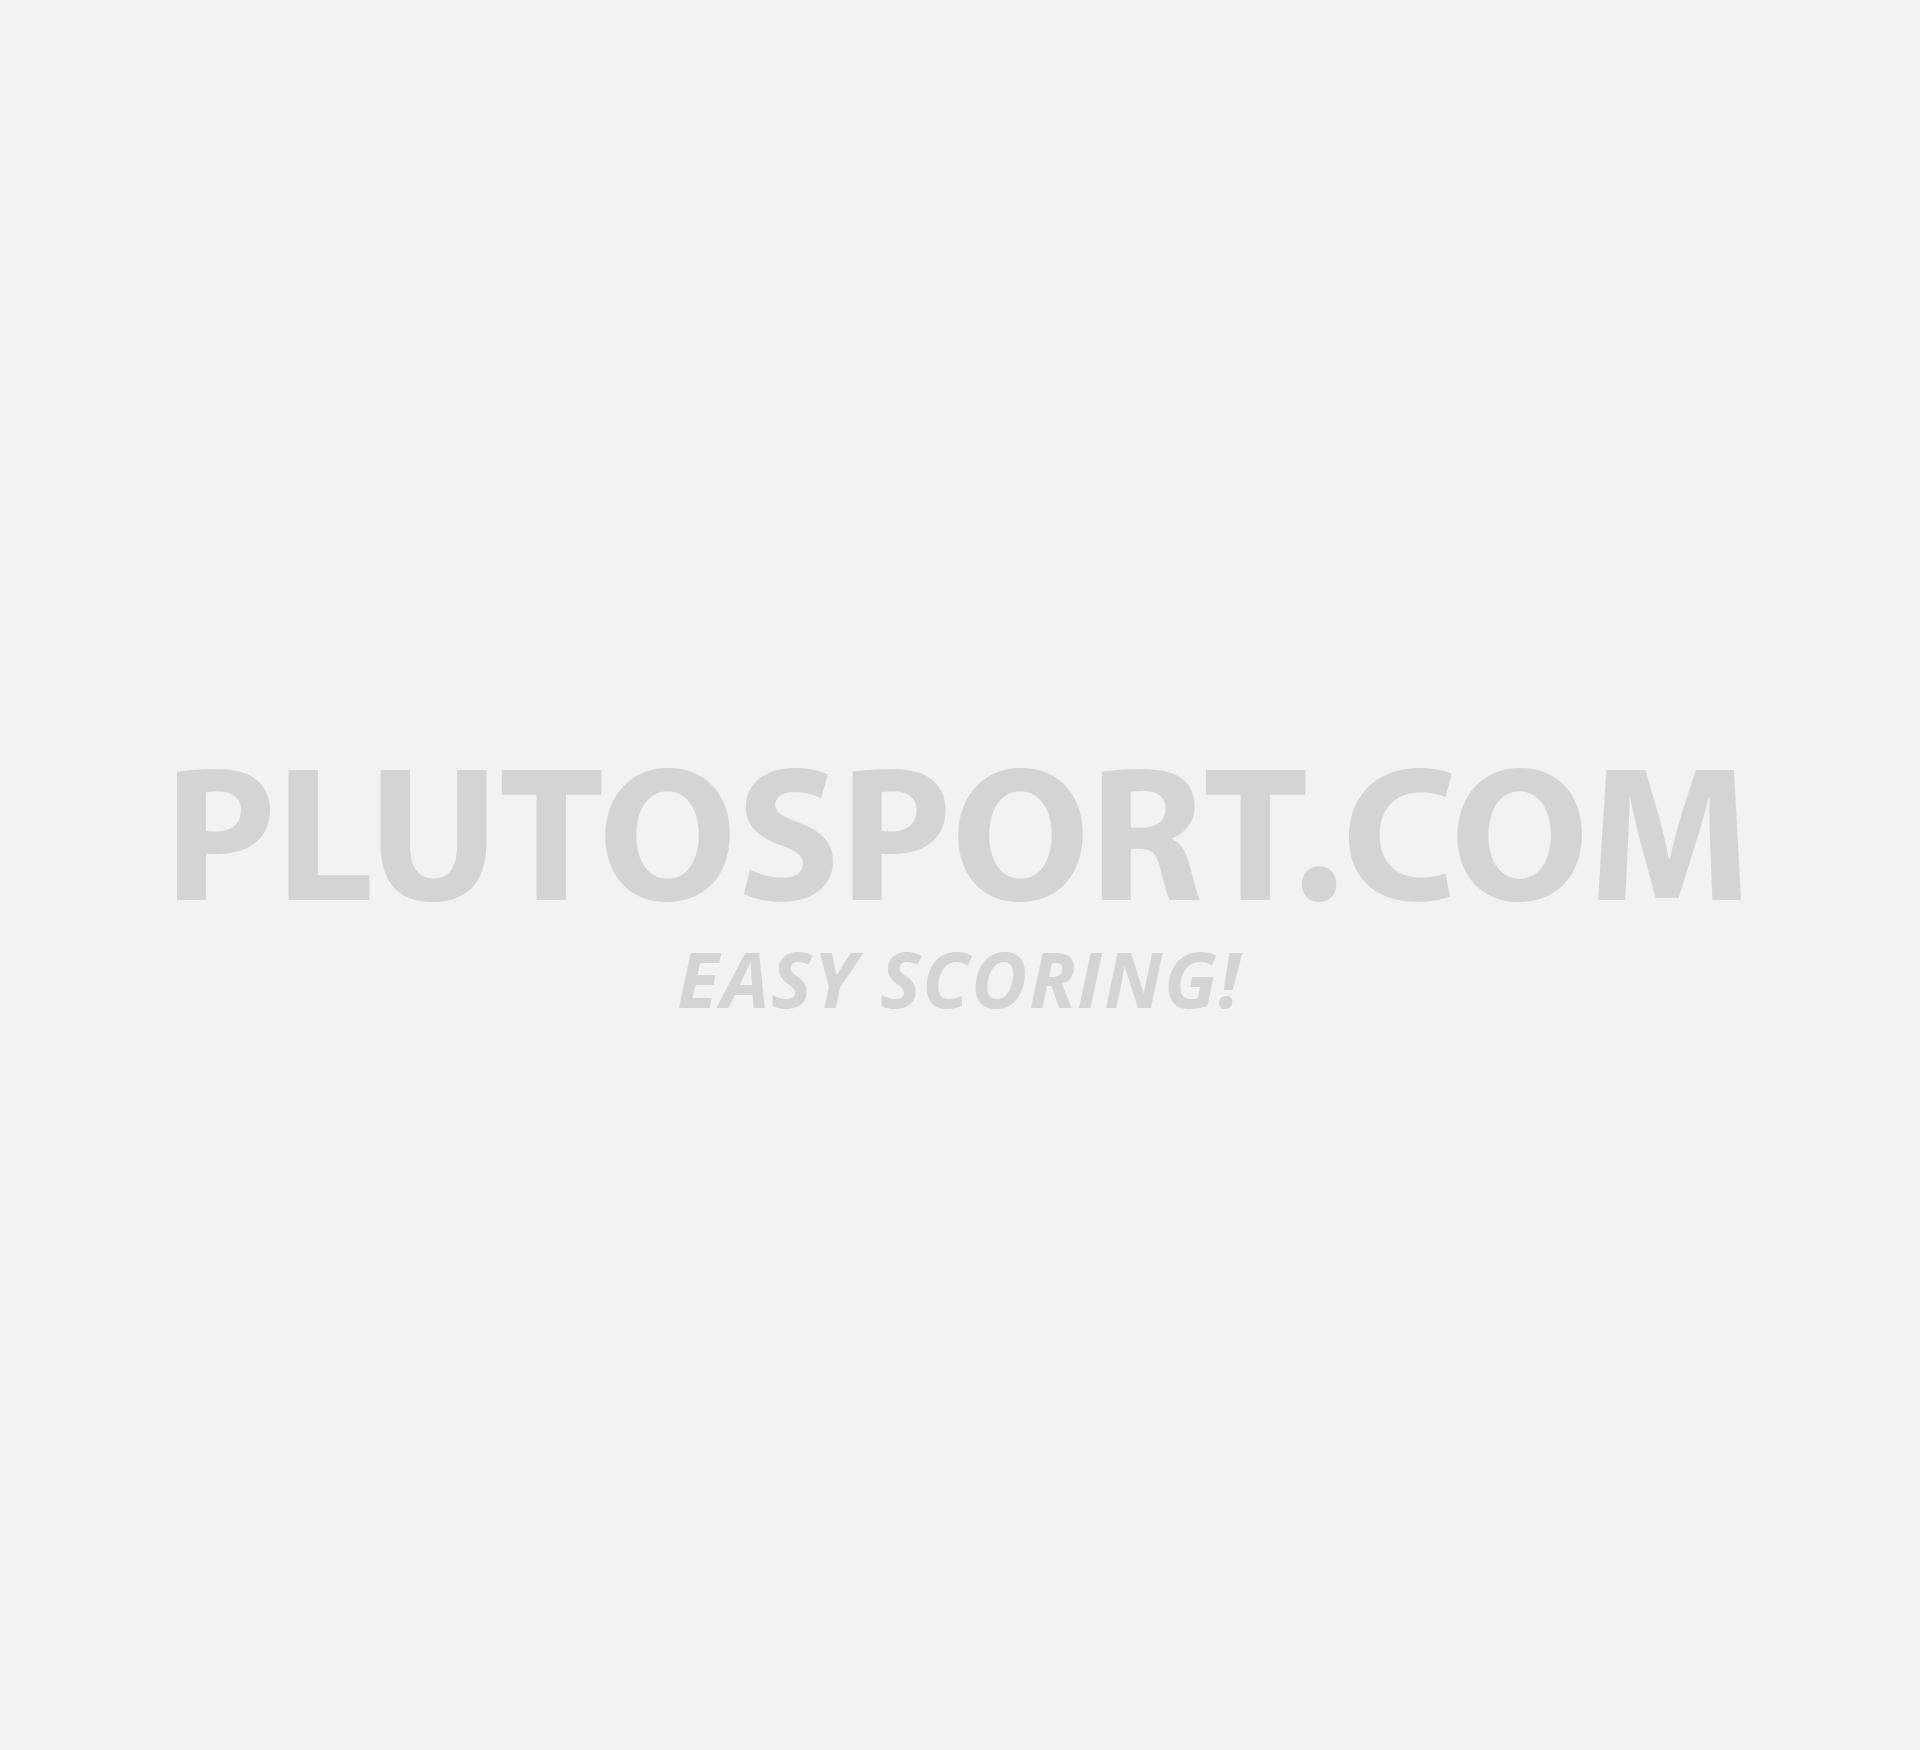 752e039710baf Lacoste Men s Sport Ultra-Dry Color Block Tennis Polo - Polo shirts -  Clothing - Tennis - Sports